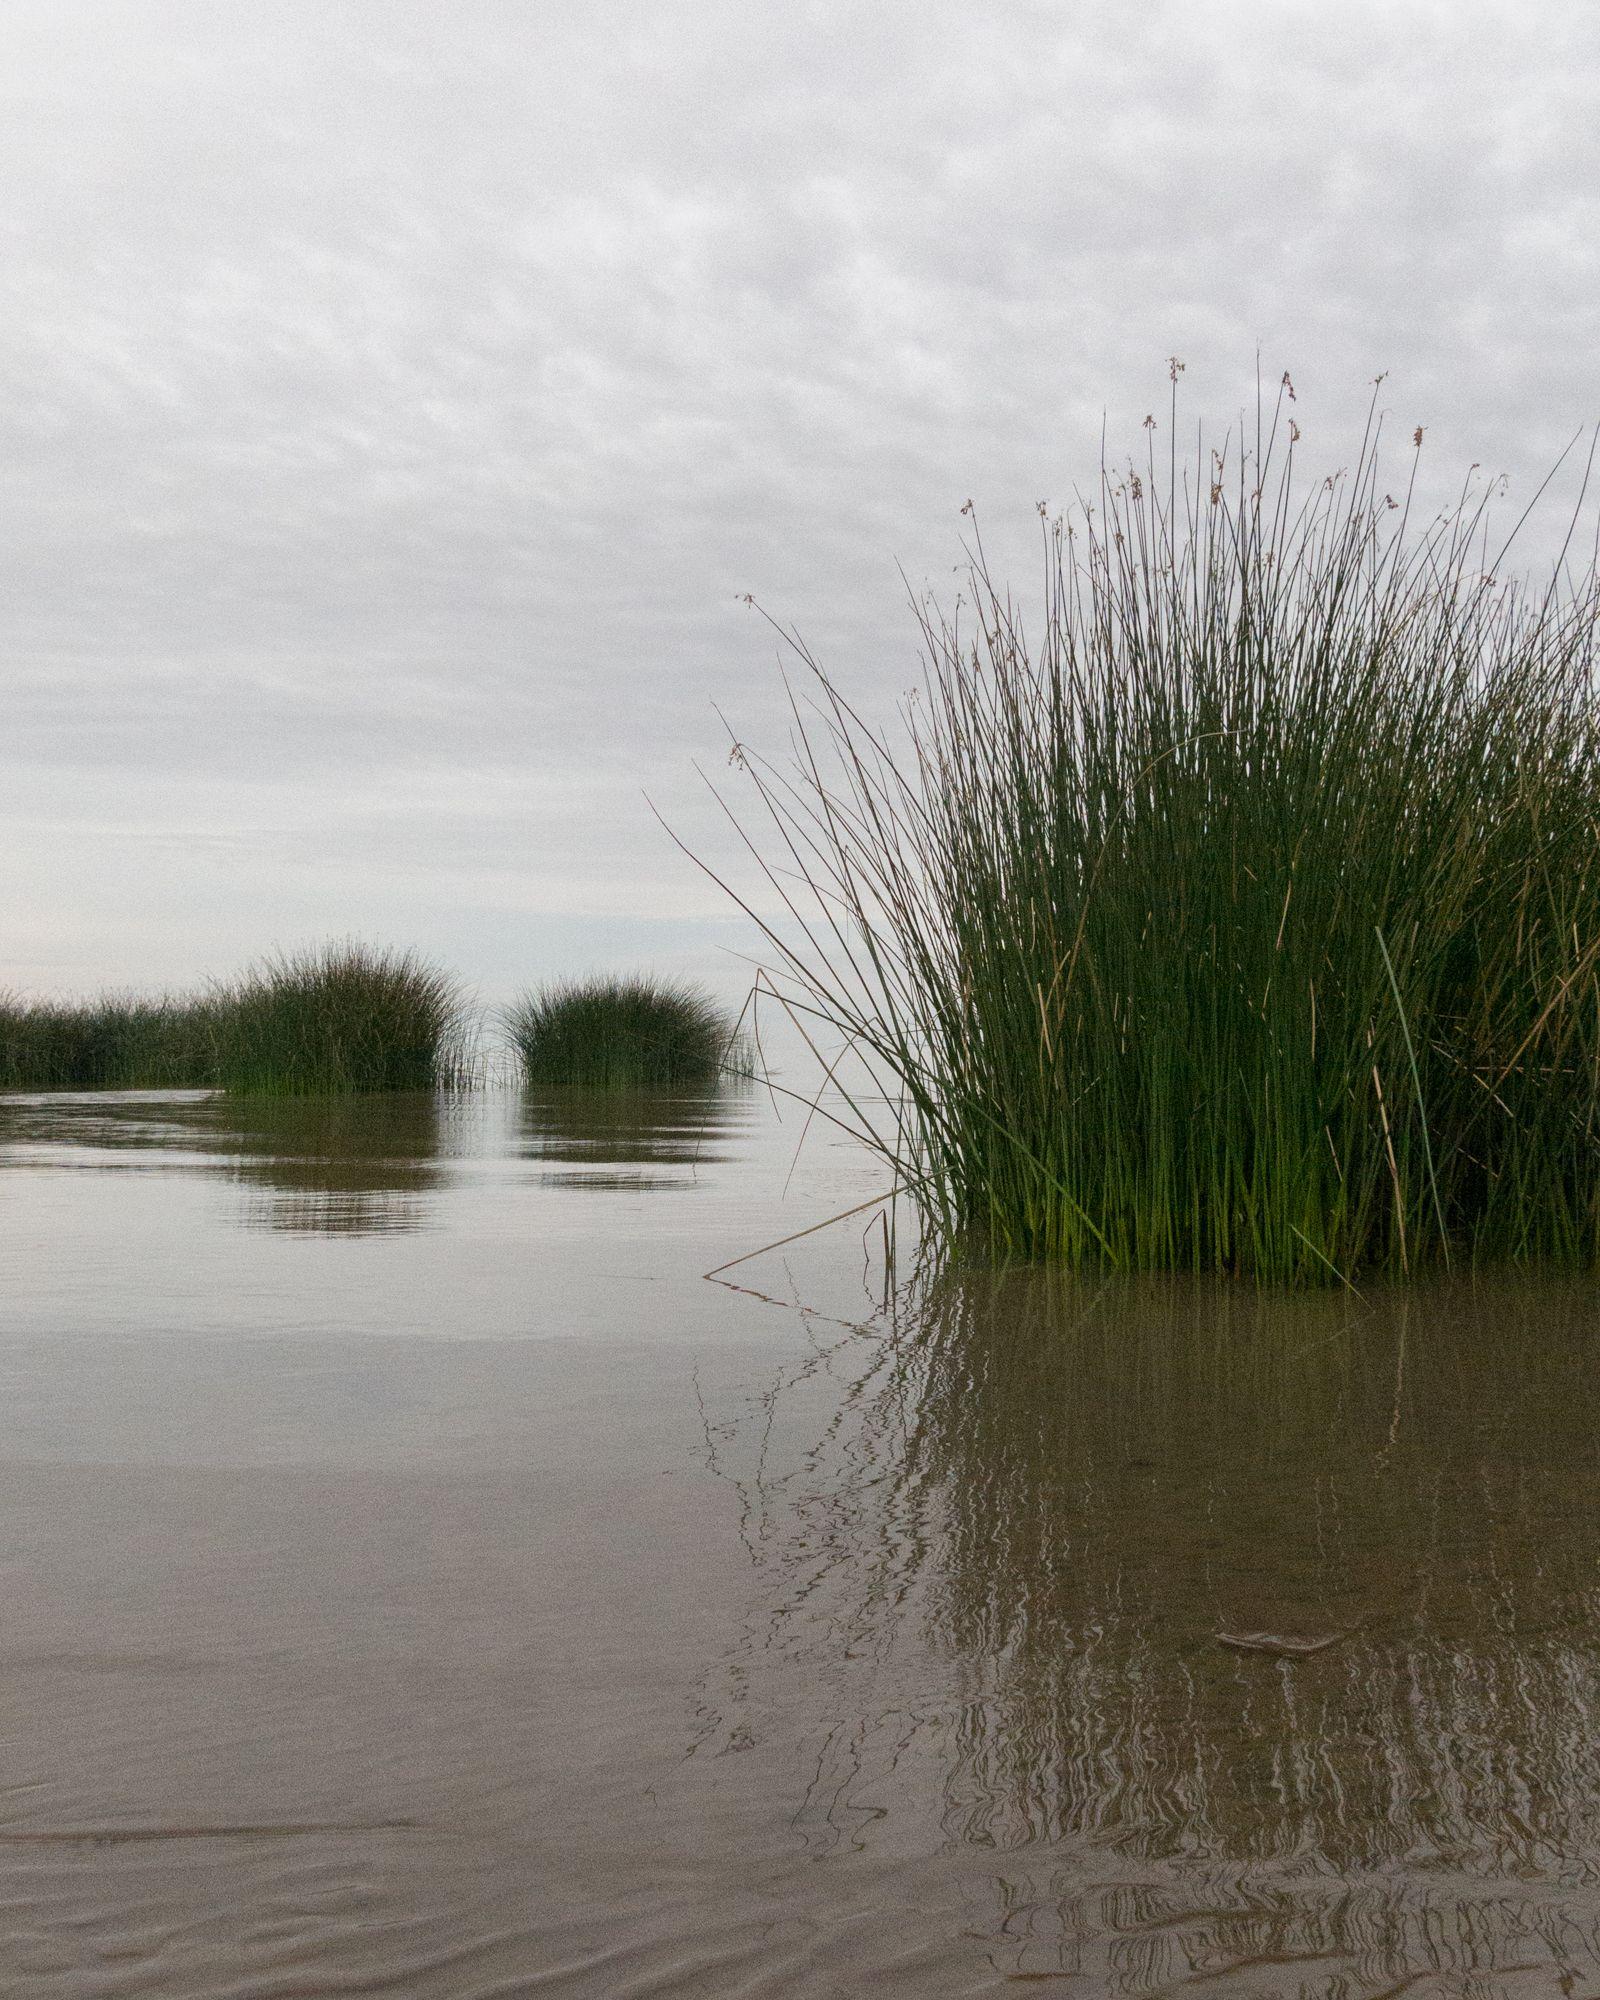 Ribera del Río de la Plata - Parque Natural Rivera Norte #02